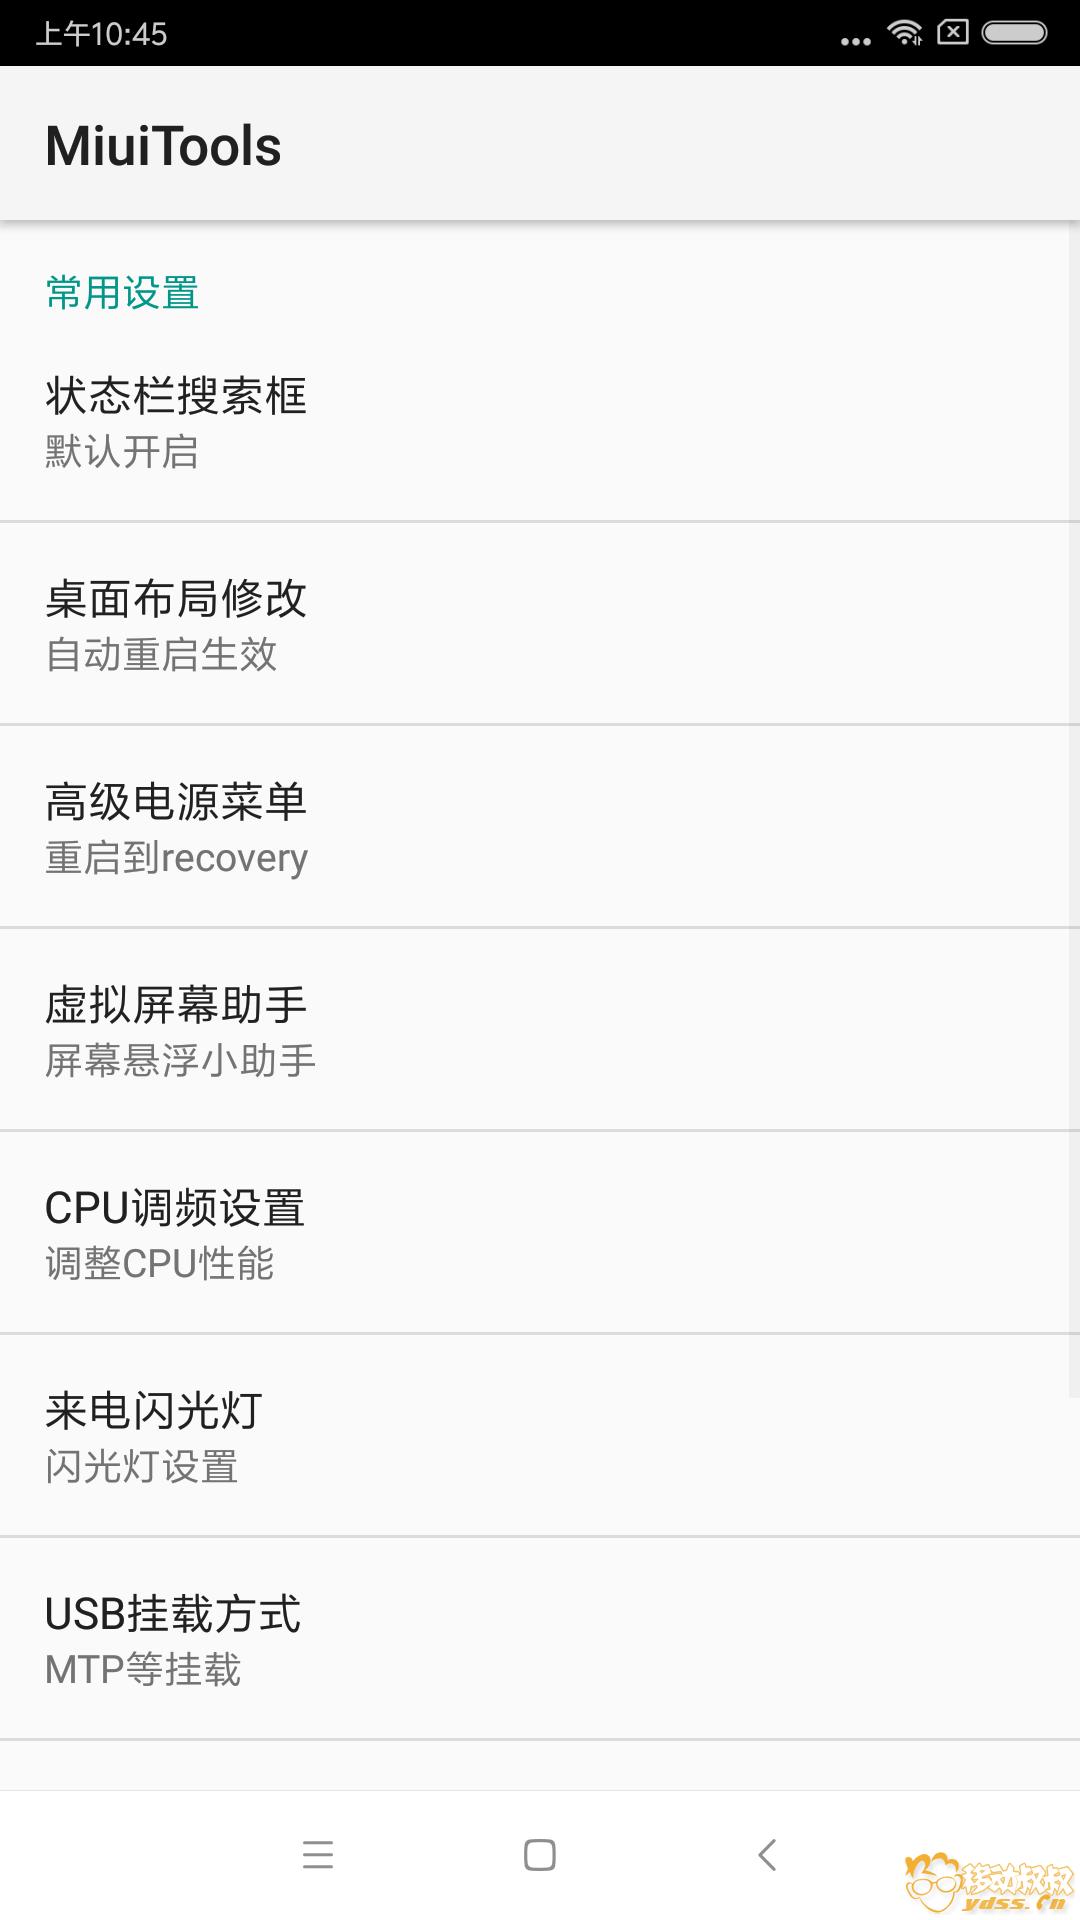 Screenshot_2018-03-09-10-45-03-301_com.anzhi.hwsettings.png